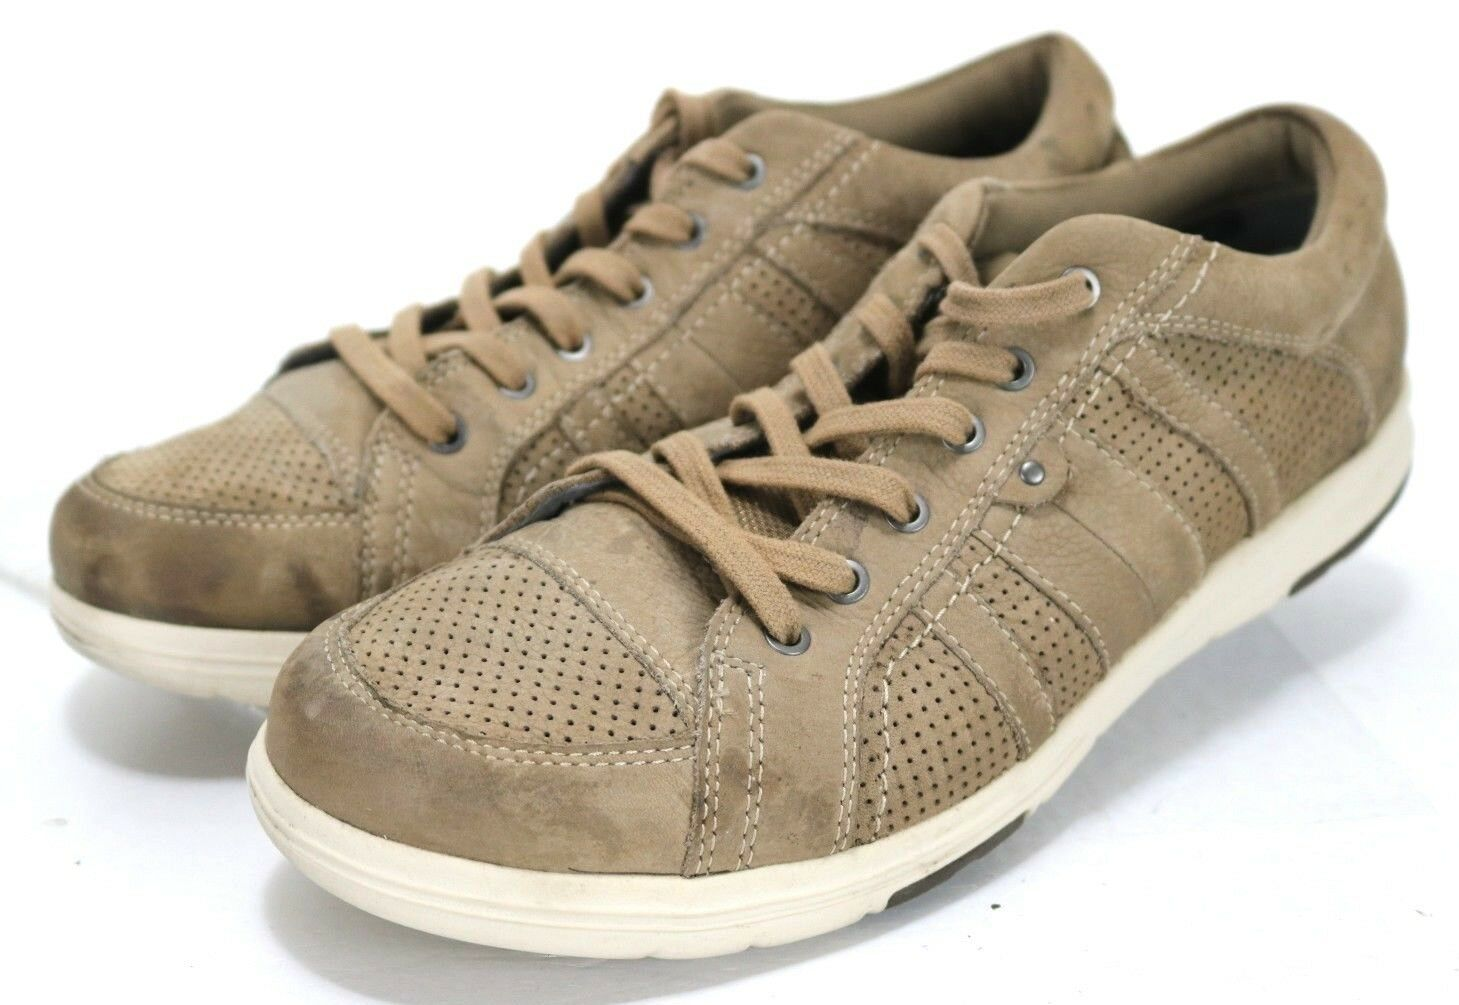 Abeo Lite Cort Sneakers  150 Men's Walking shoes Size 10.5 Tan